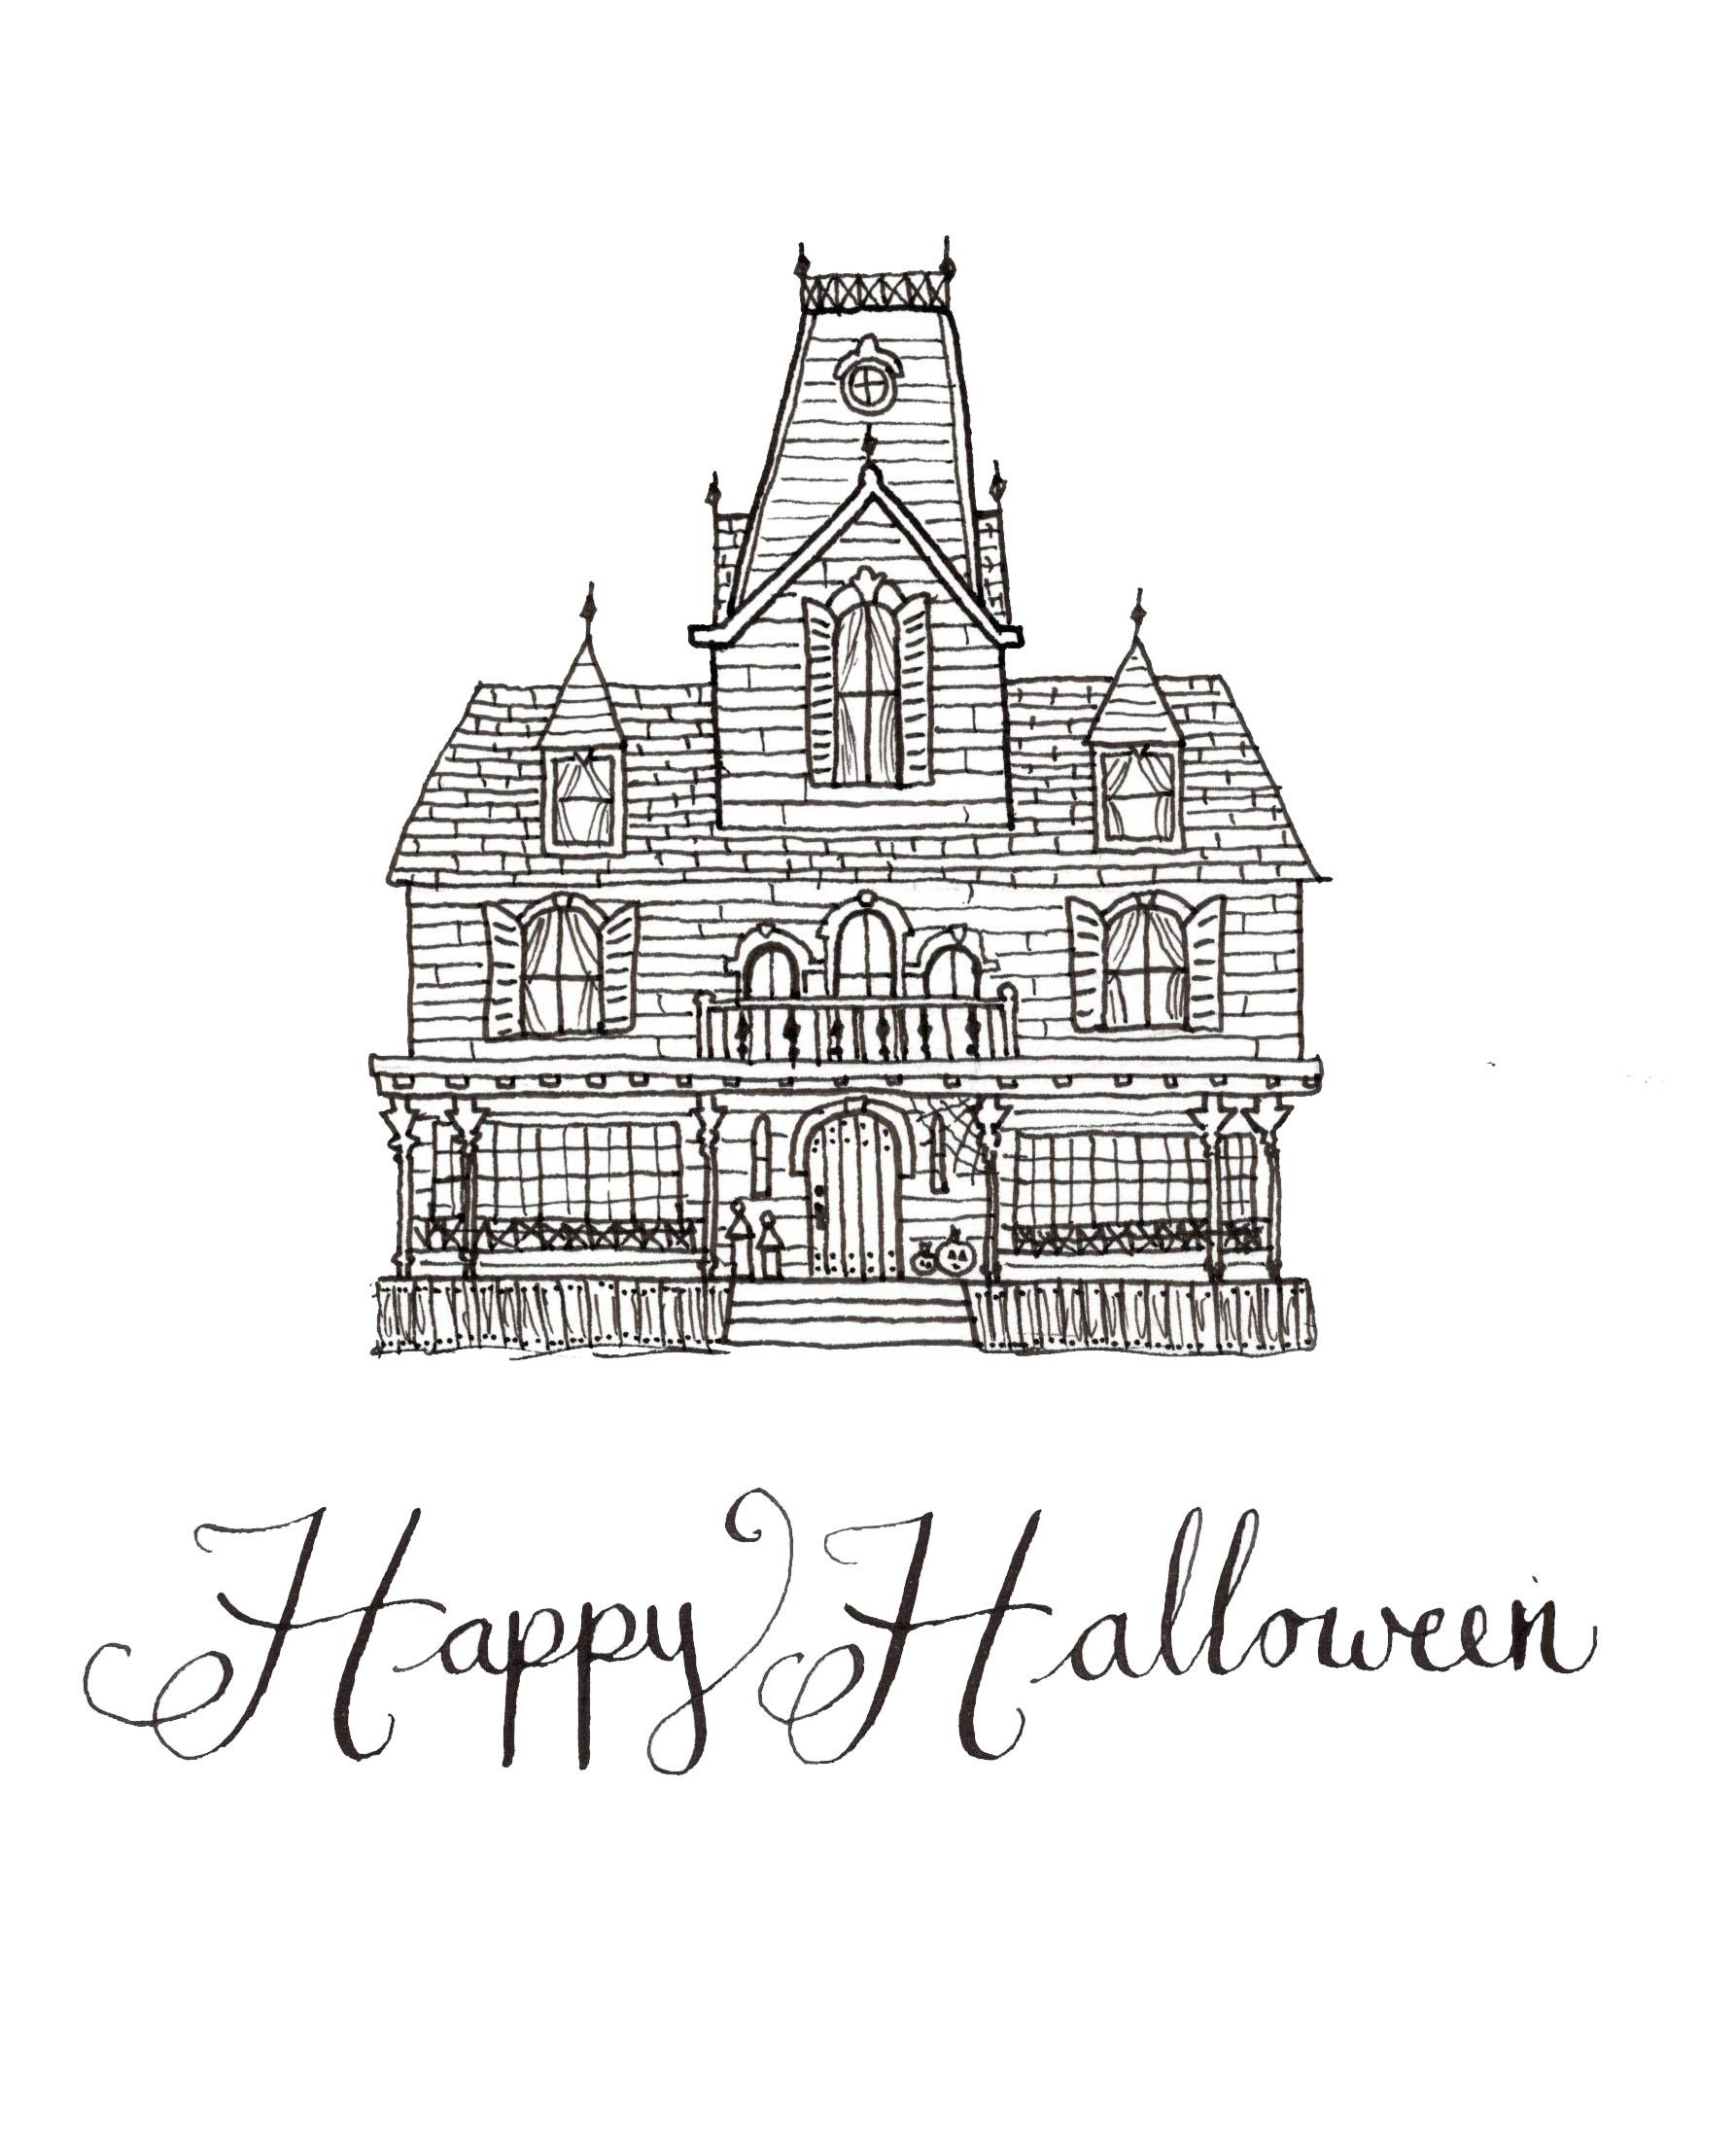 2015_HalloweenSketch001.jpg